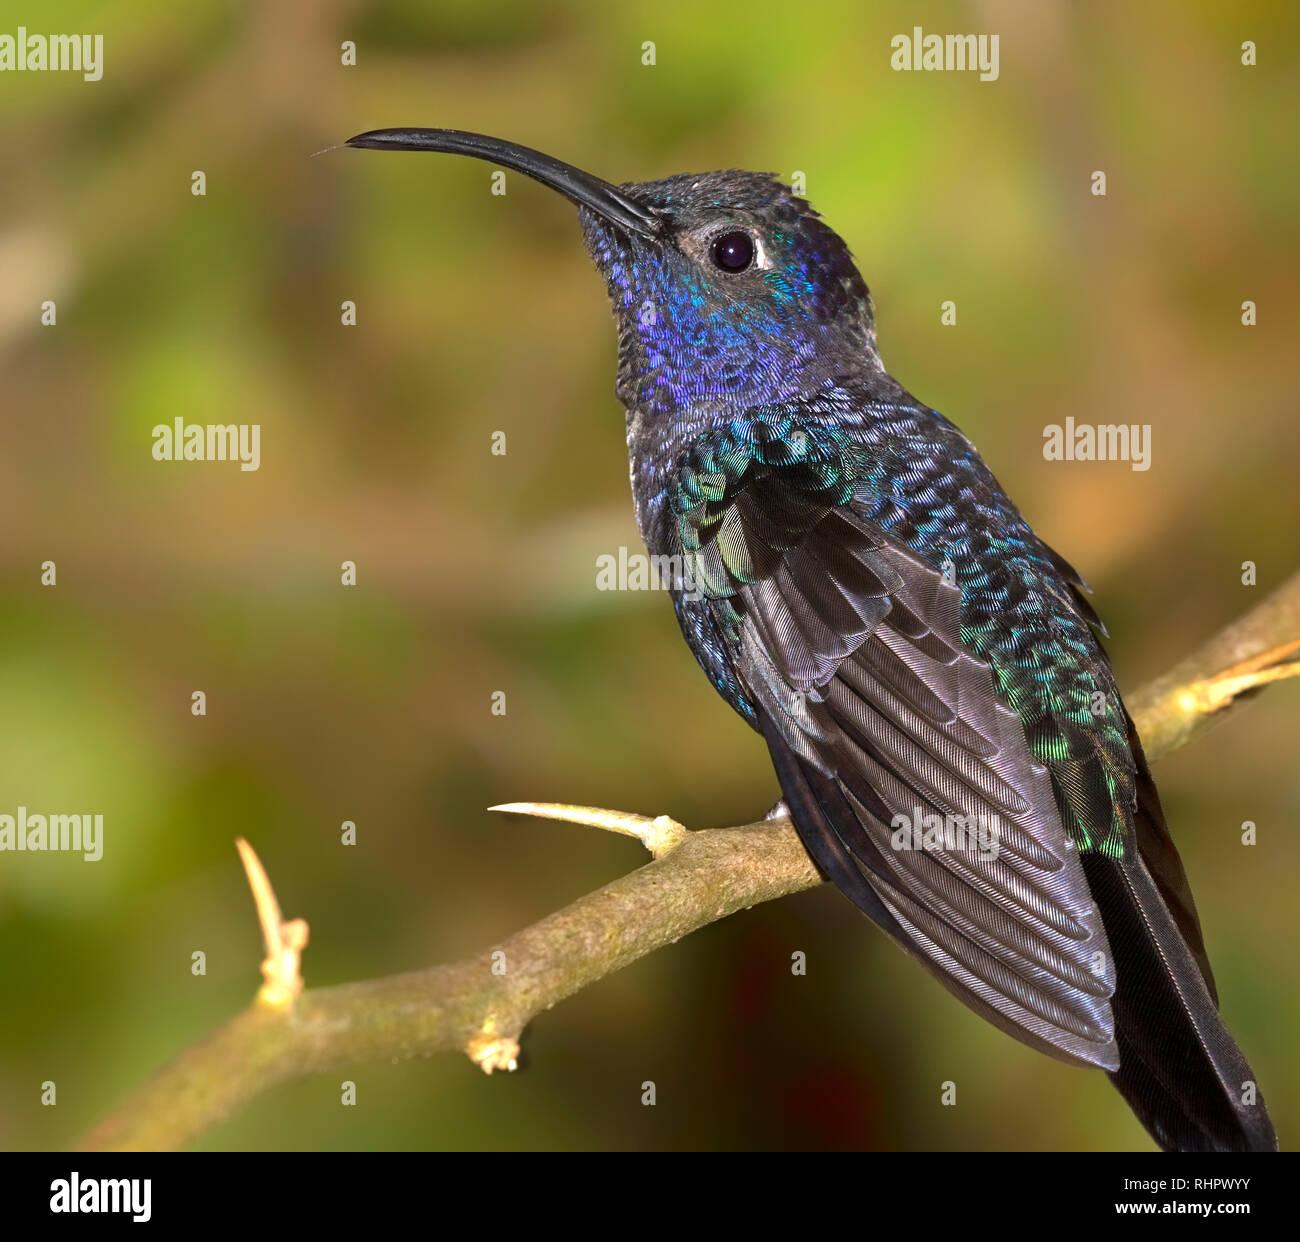 Violet sabrewing (Campylopterus hemileucurus) perched on a branch, Alajuela, Costa Rica Stock Photo